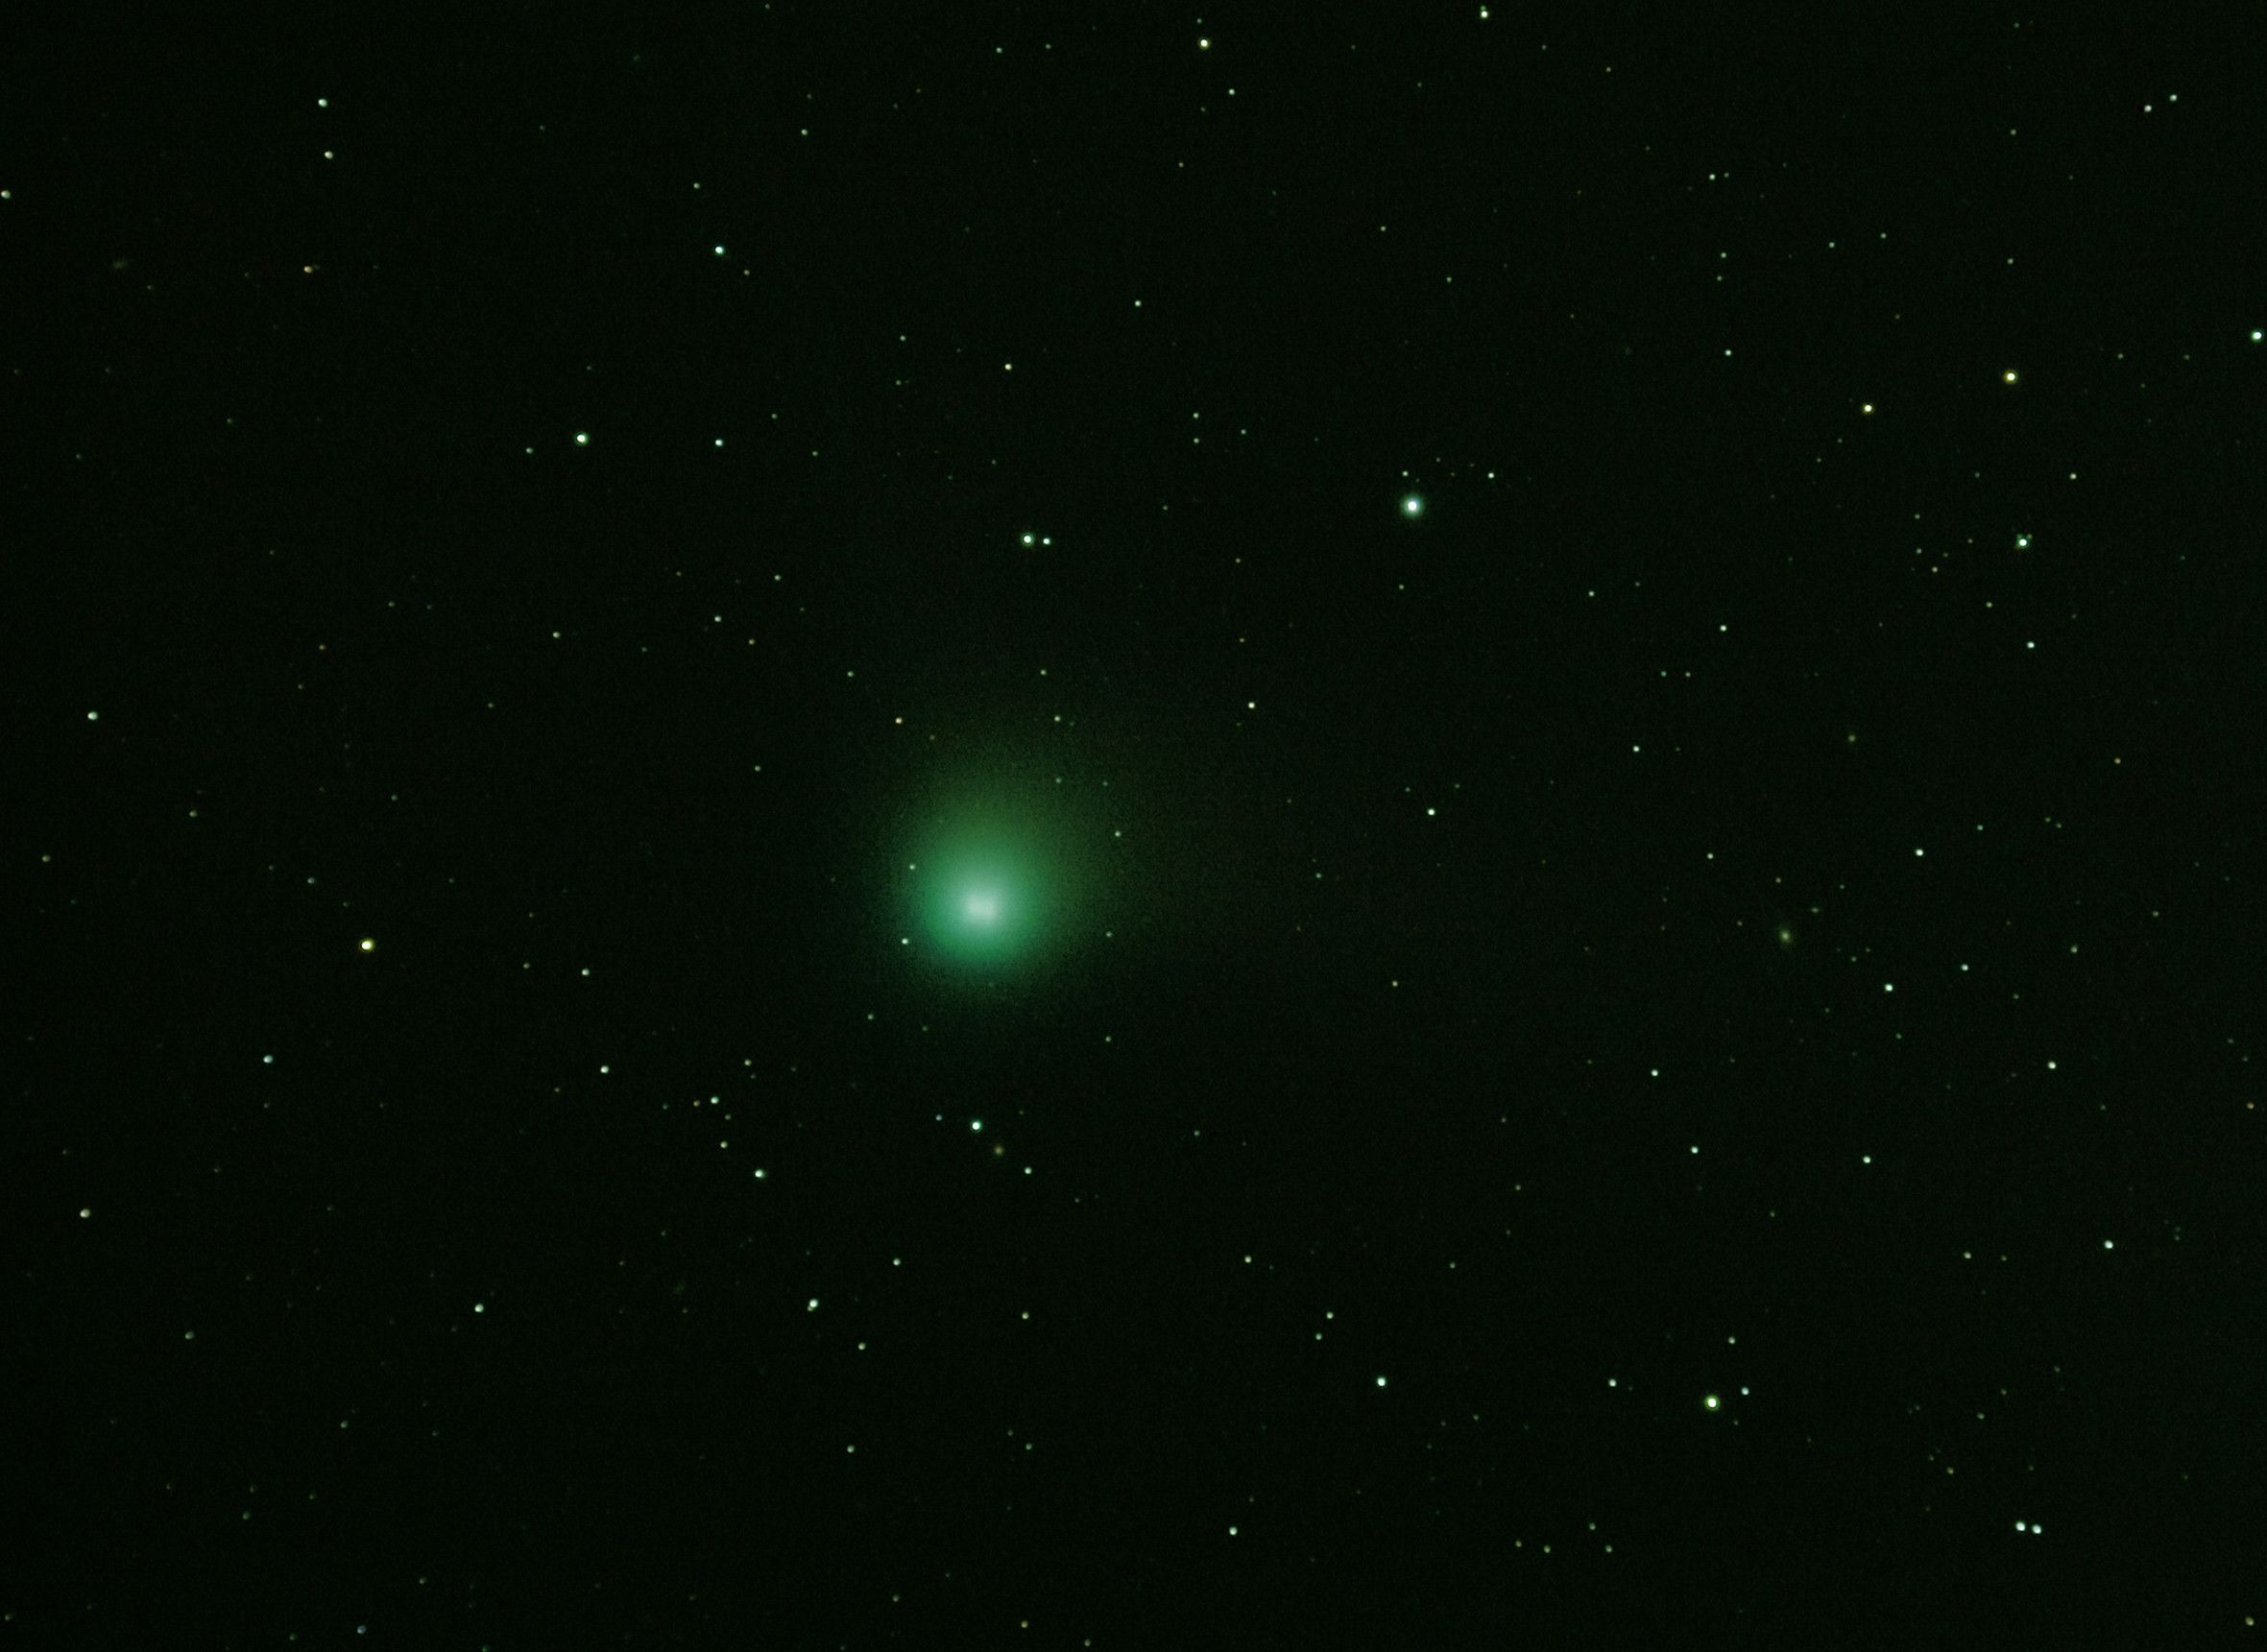 Comet Catalina C/2013 US10